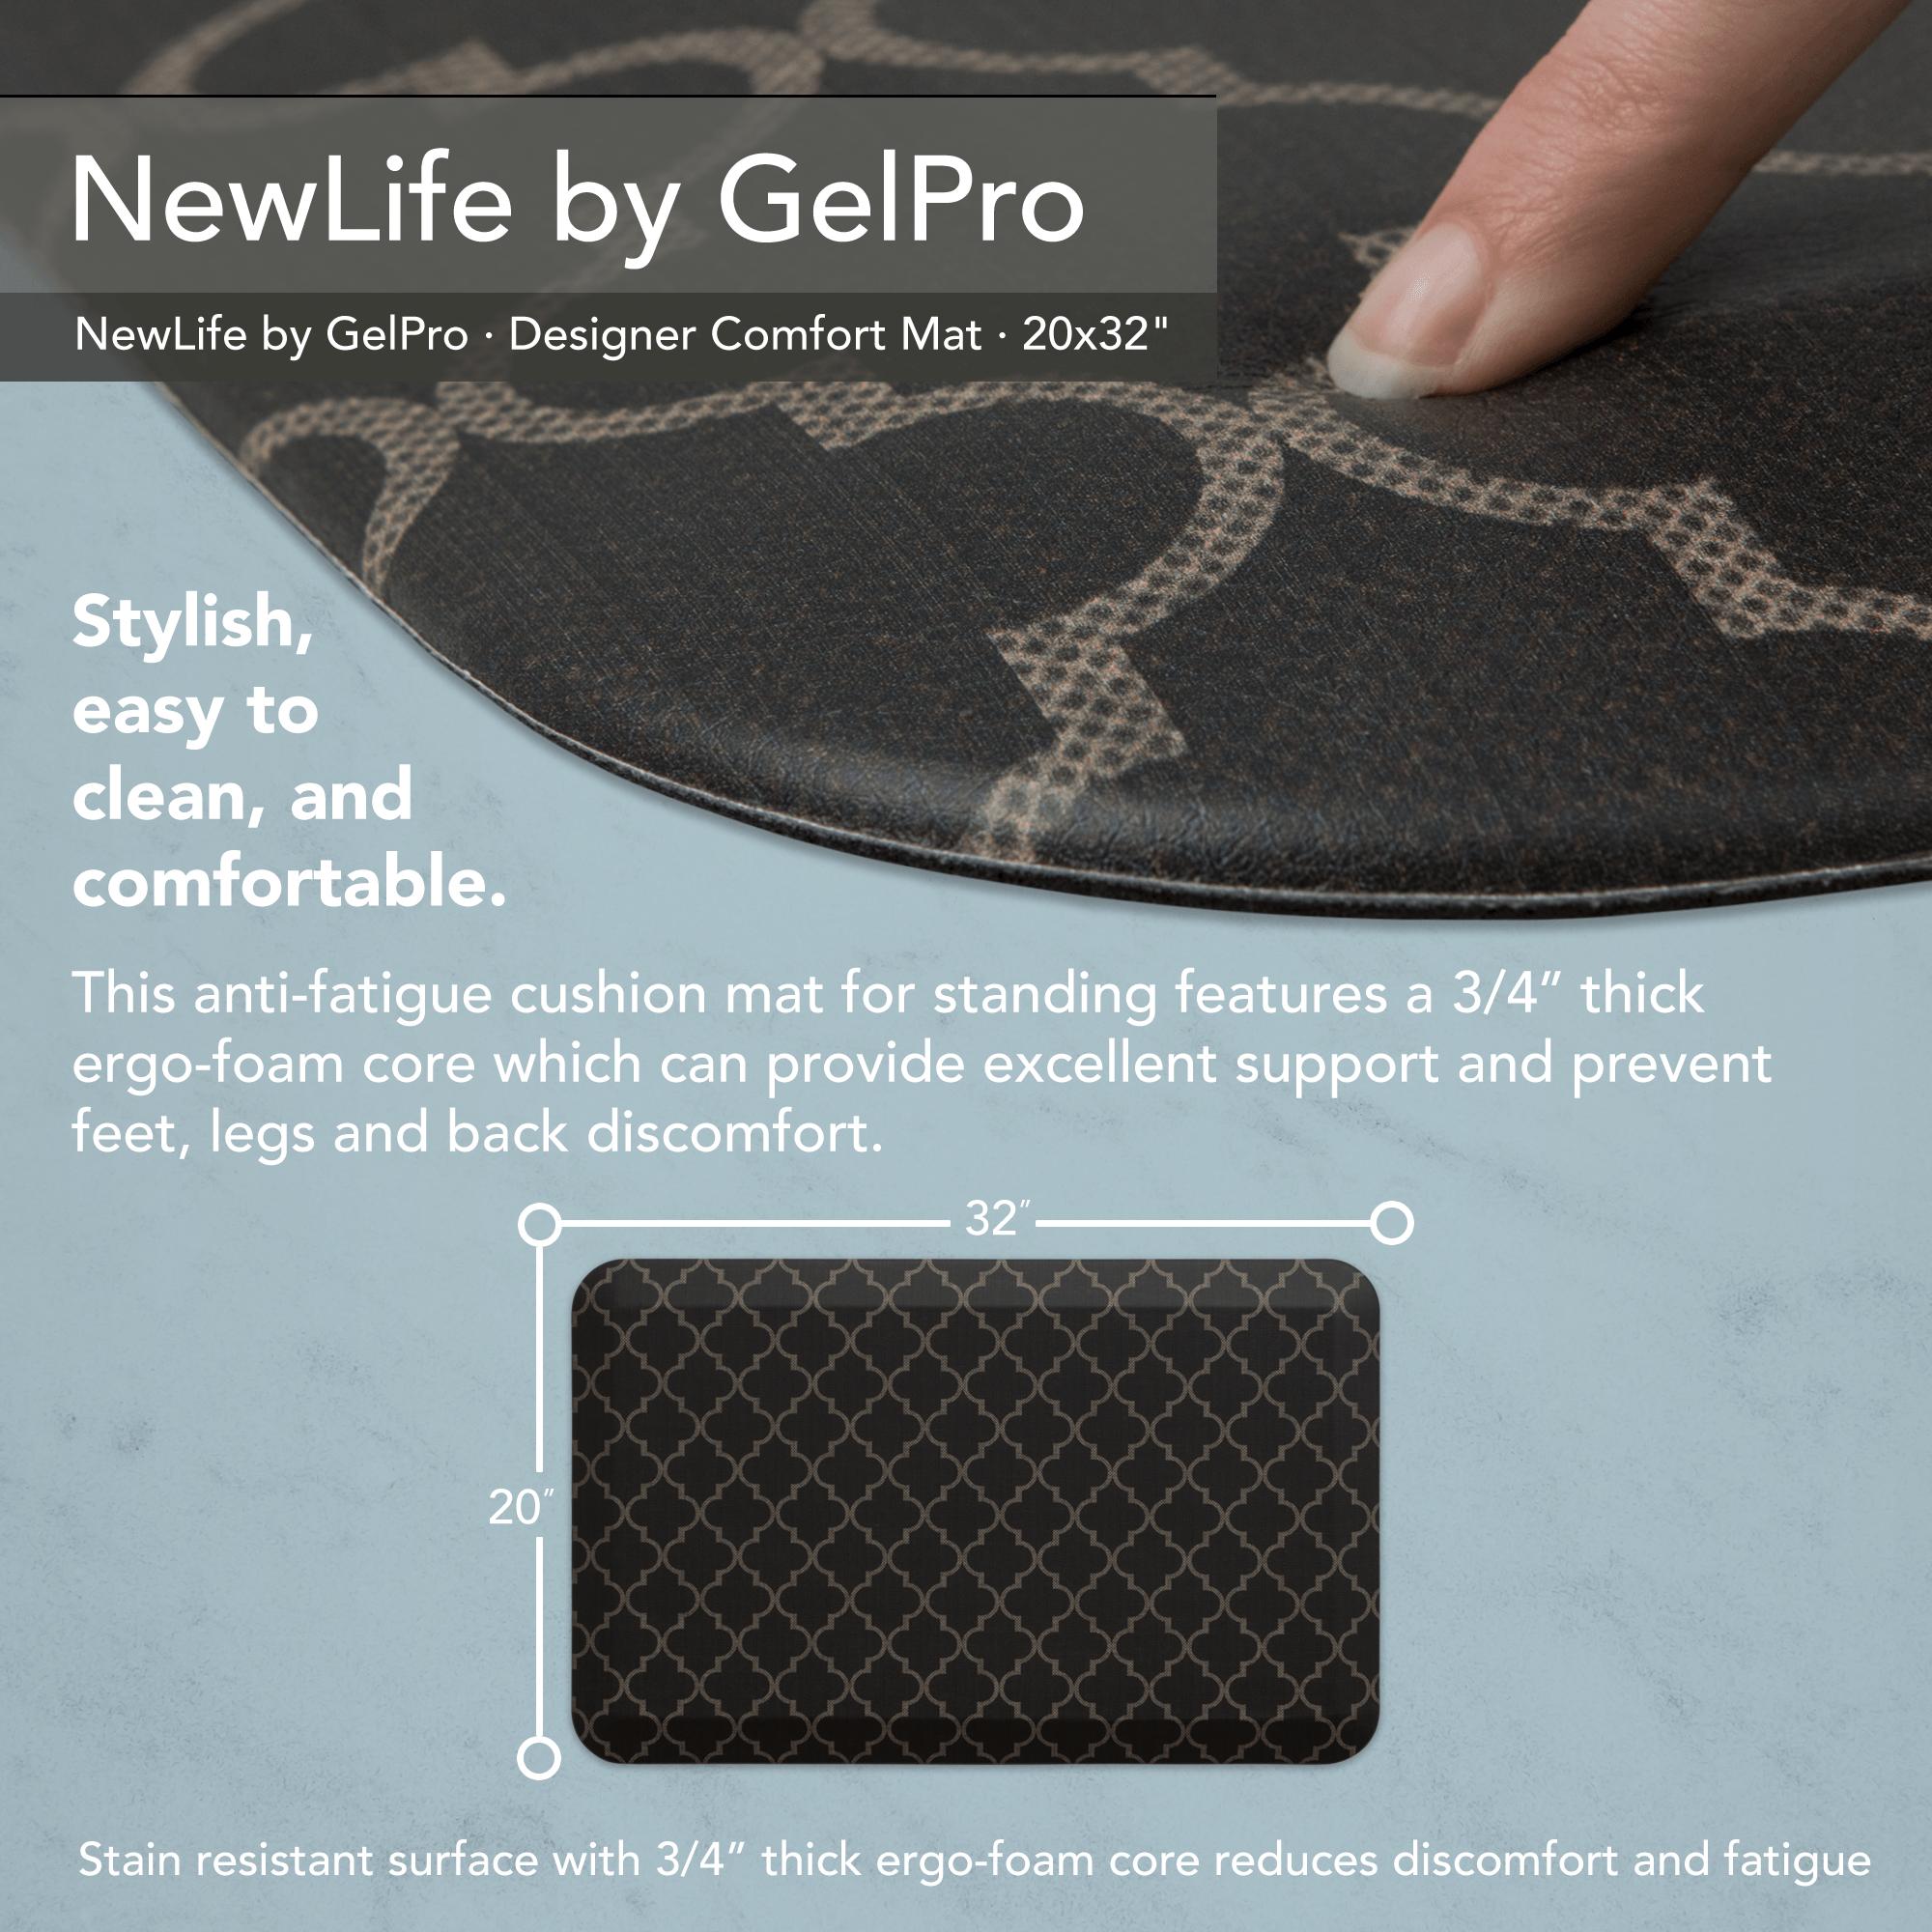 Lattice Java 20 x 48 NewLife by GelPro Designer Comfort Mat